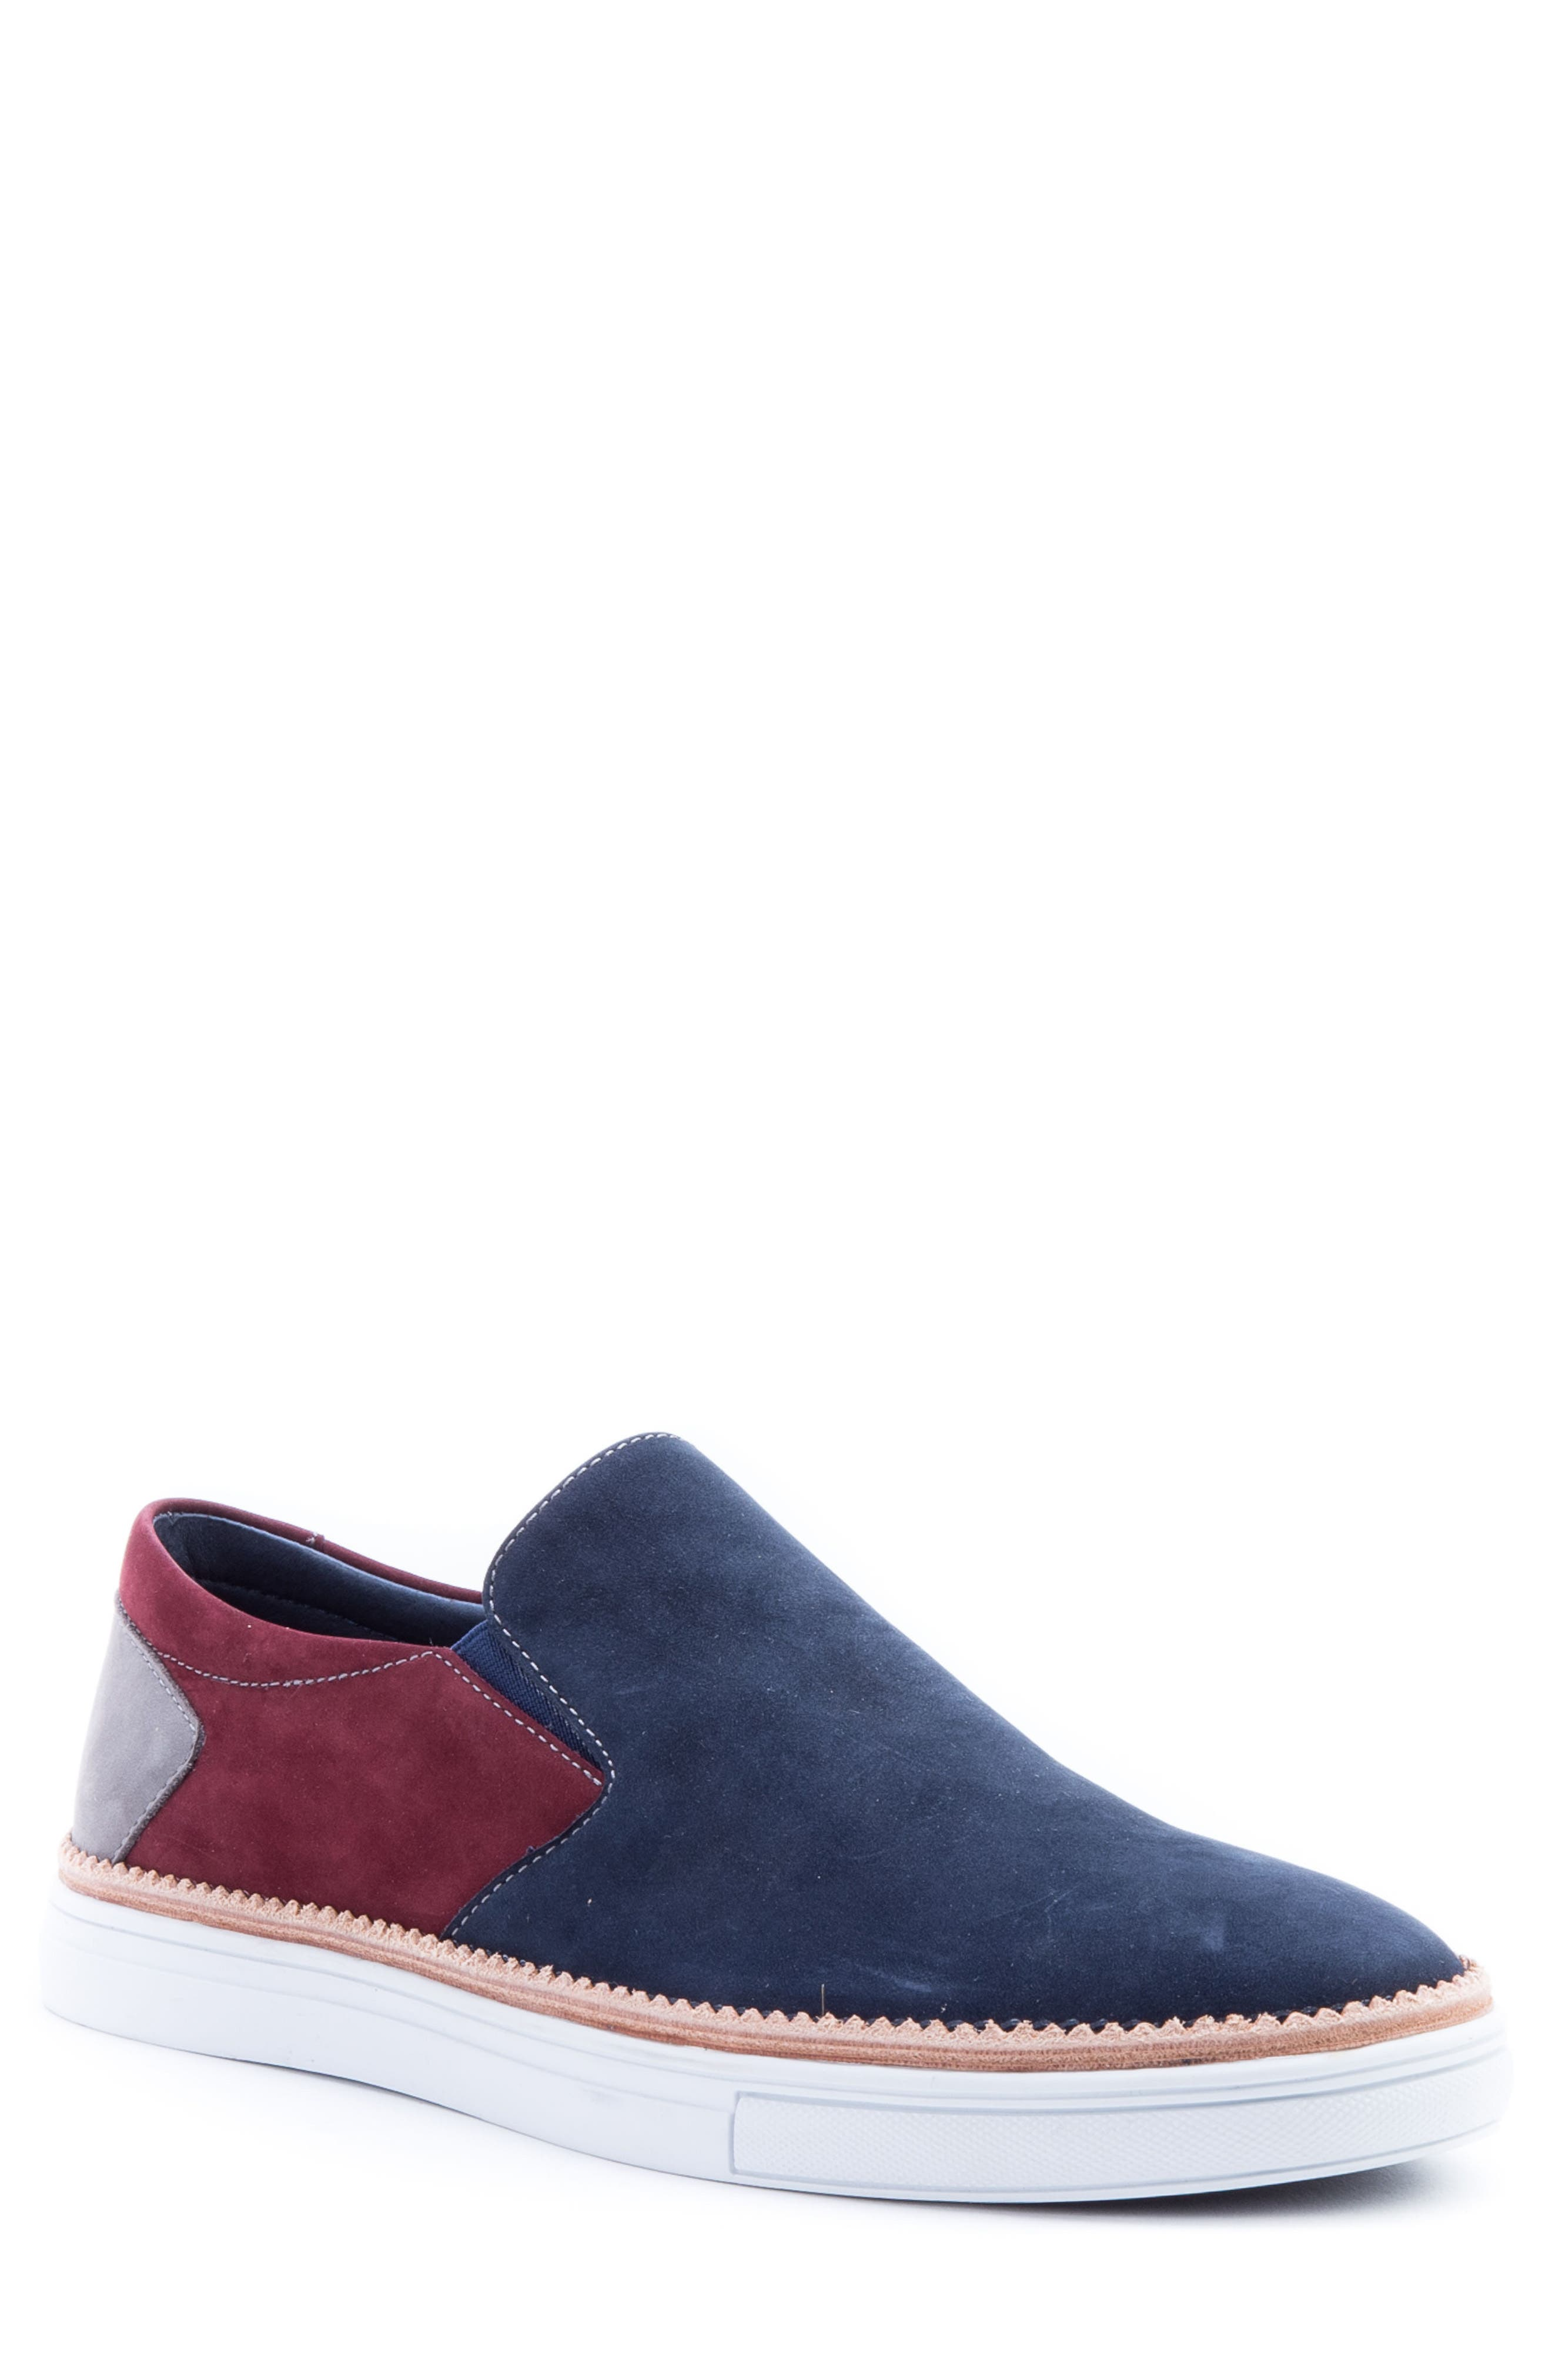 Zanzara Rivera Colorblocked Slip-On Sneaker, Blue